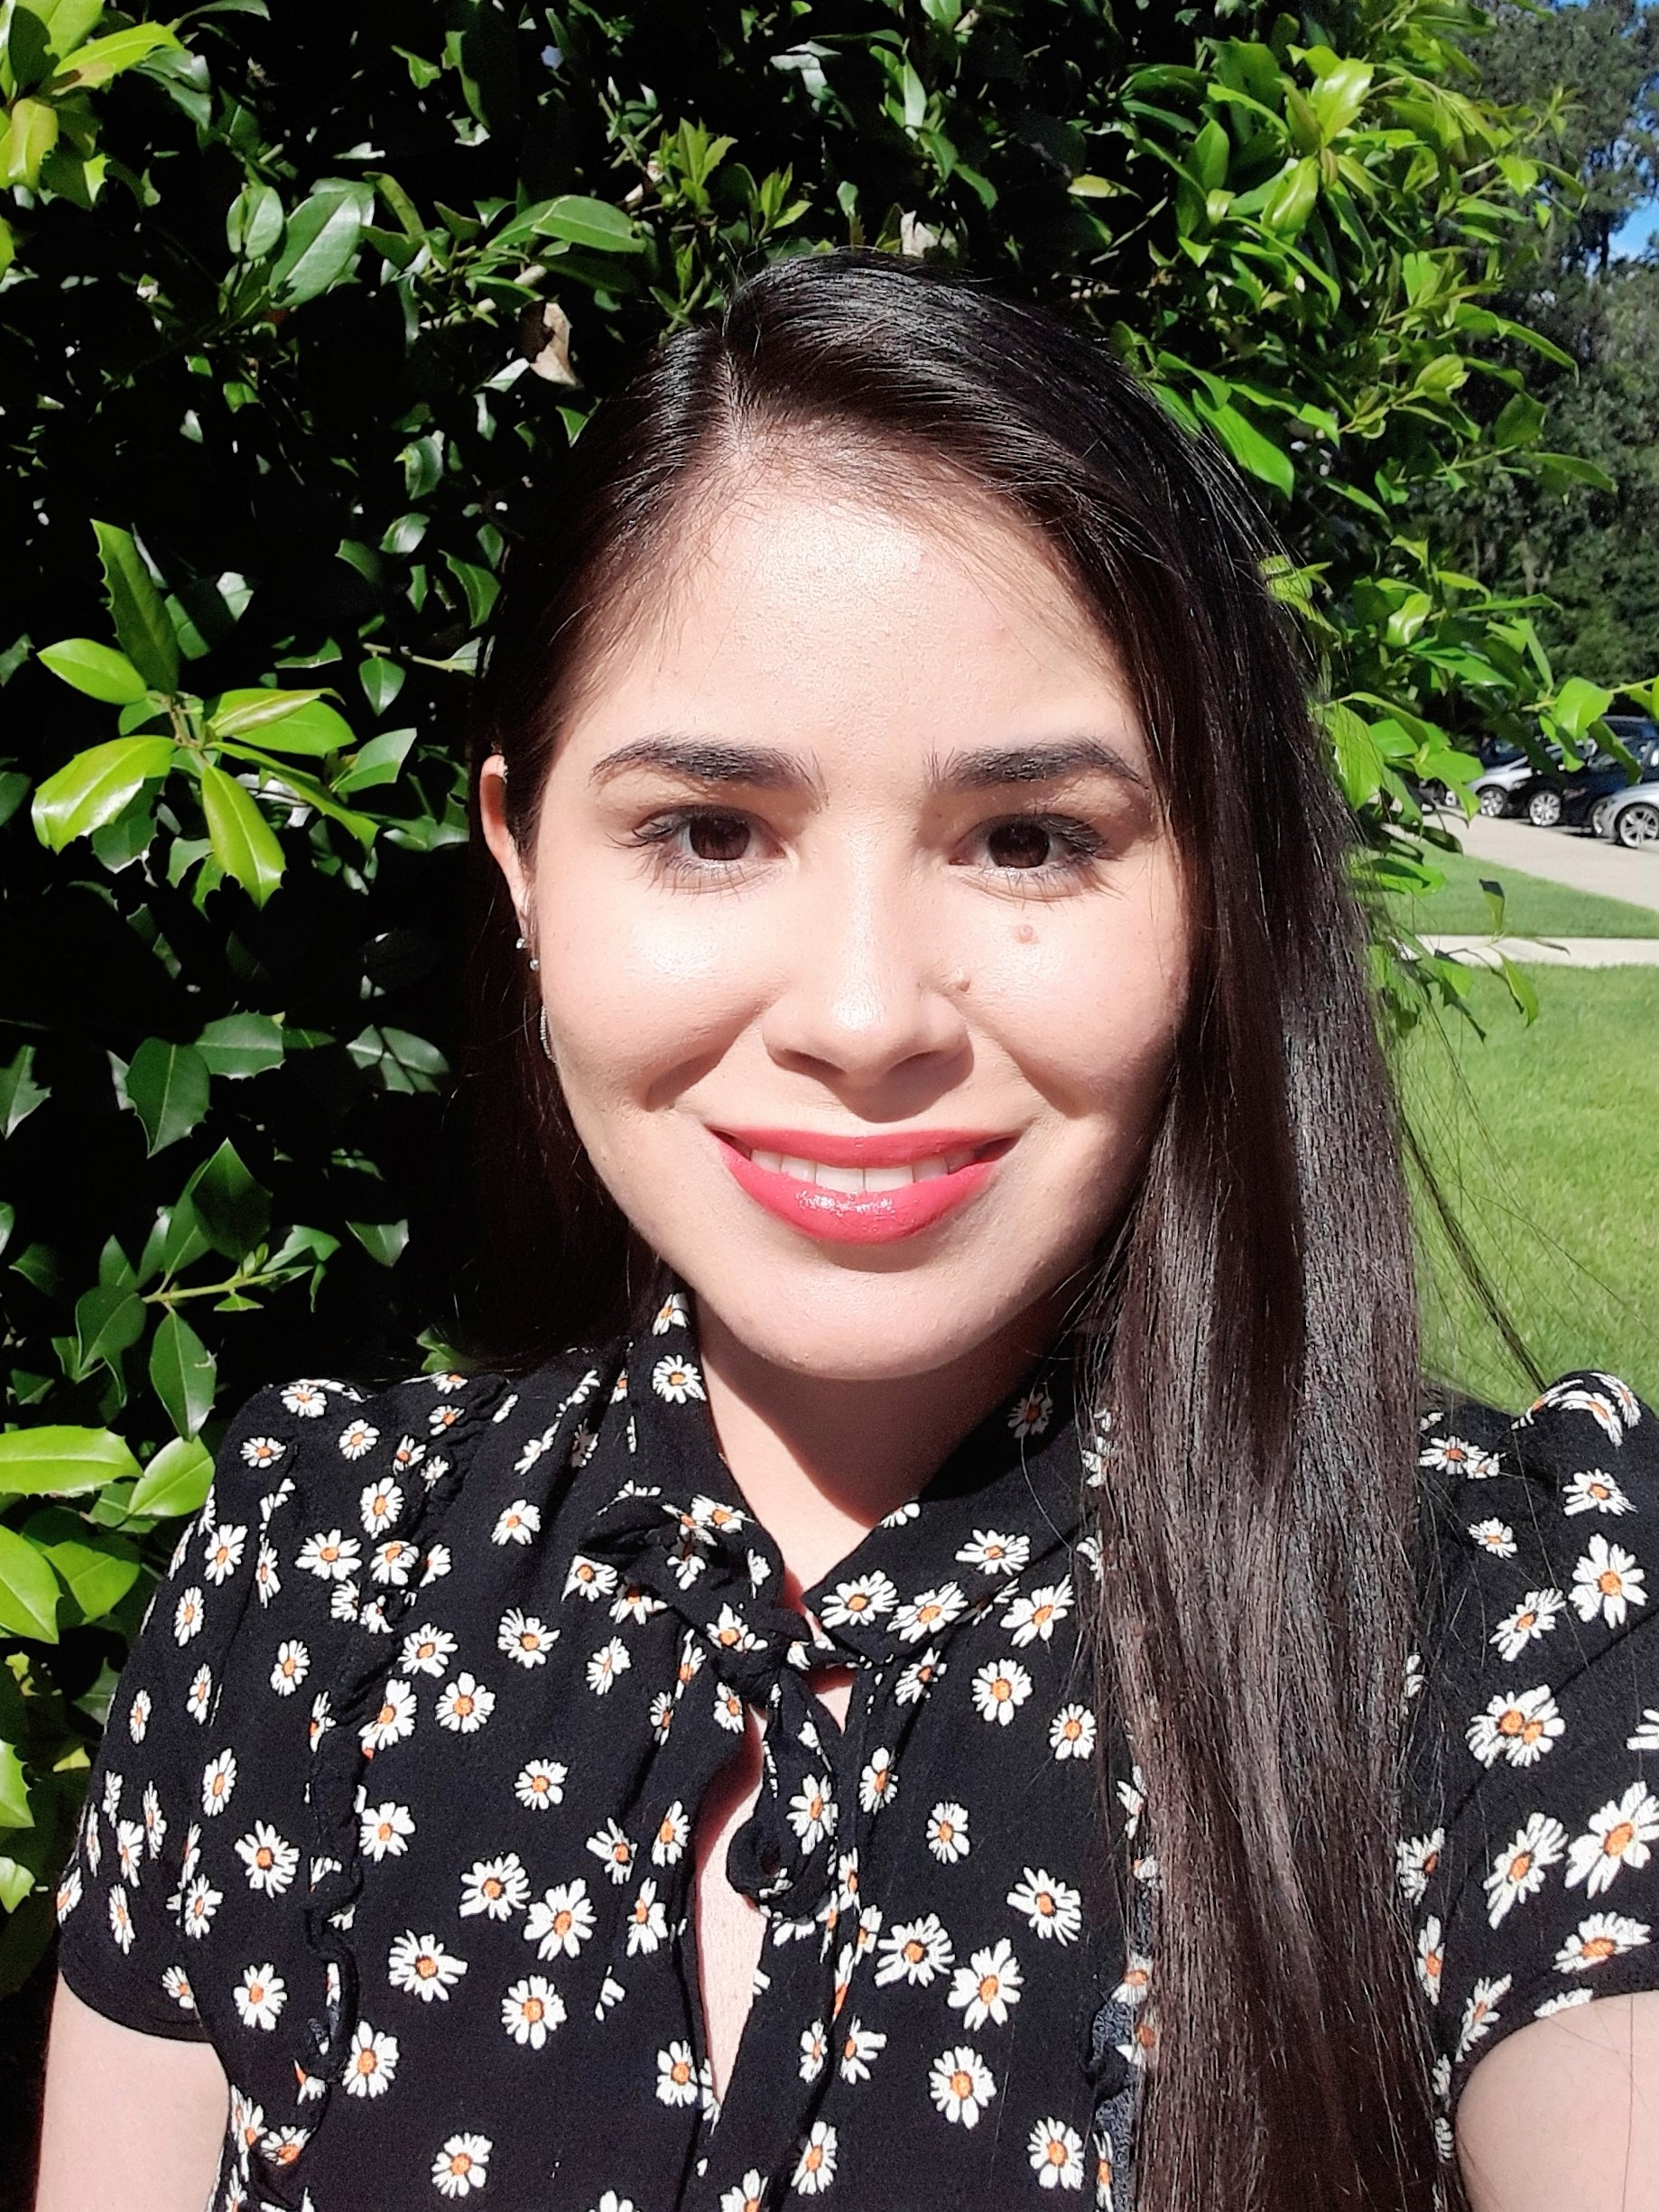 Adriana G. Morales Rivera